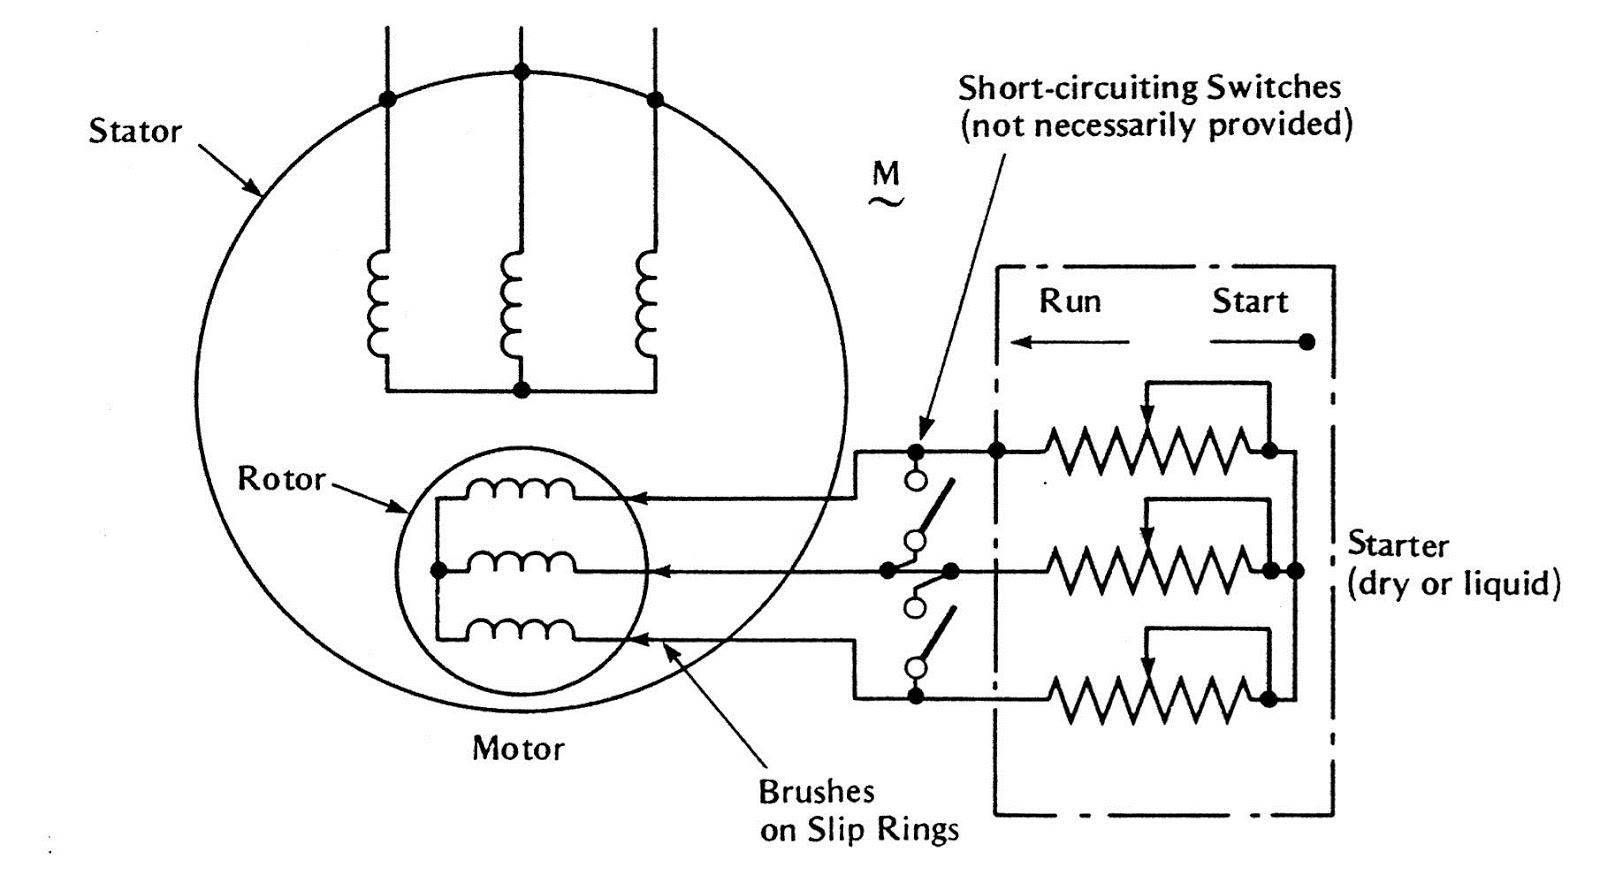 General Motors Wiring Diagram Symbols Amazon Rainforest Layers Electric Induction Motor